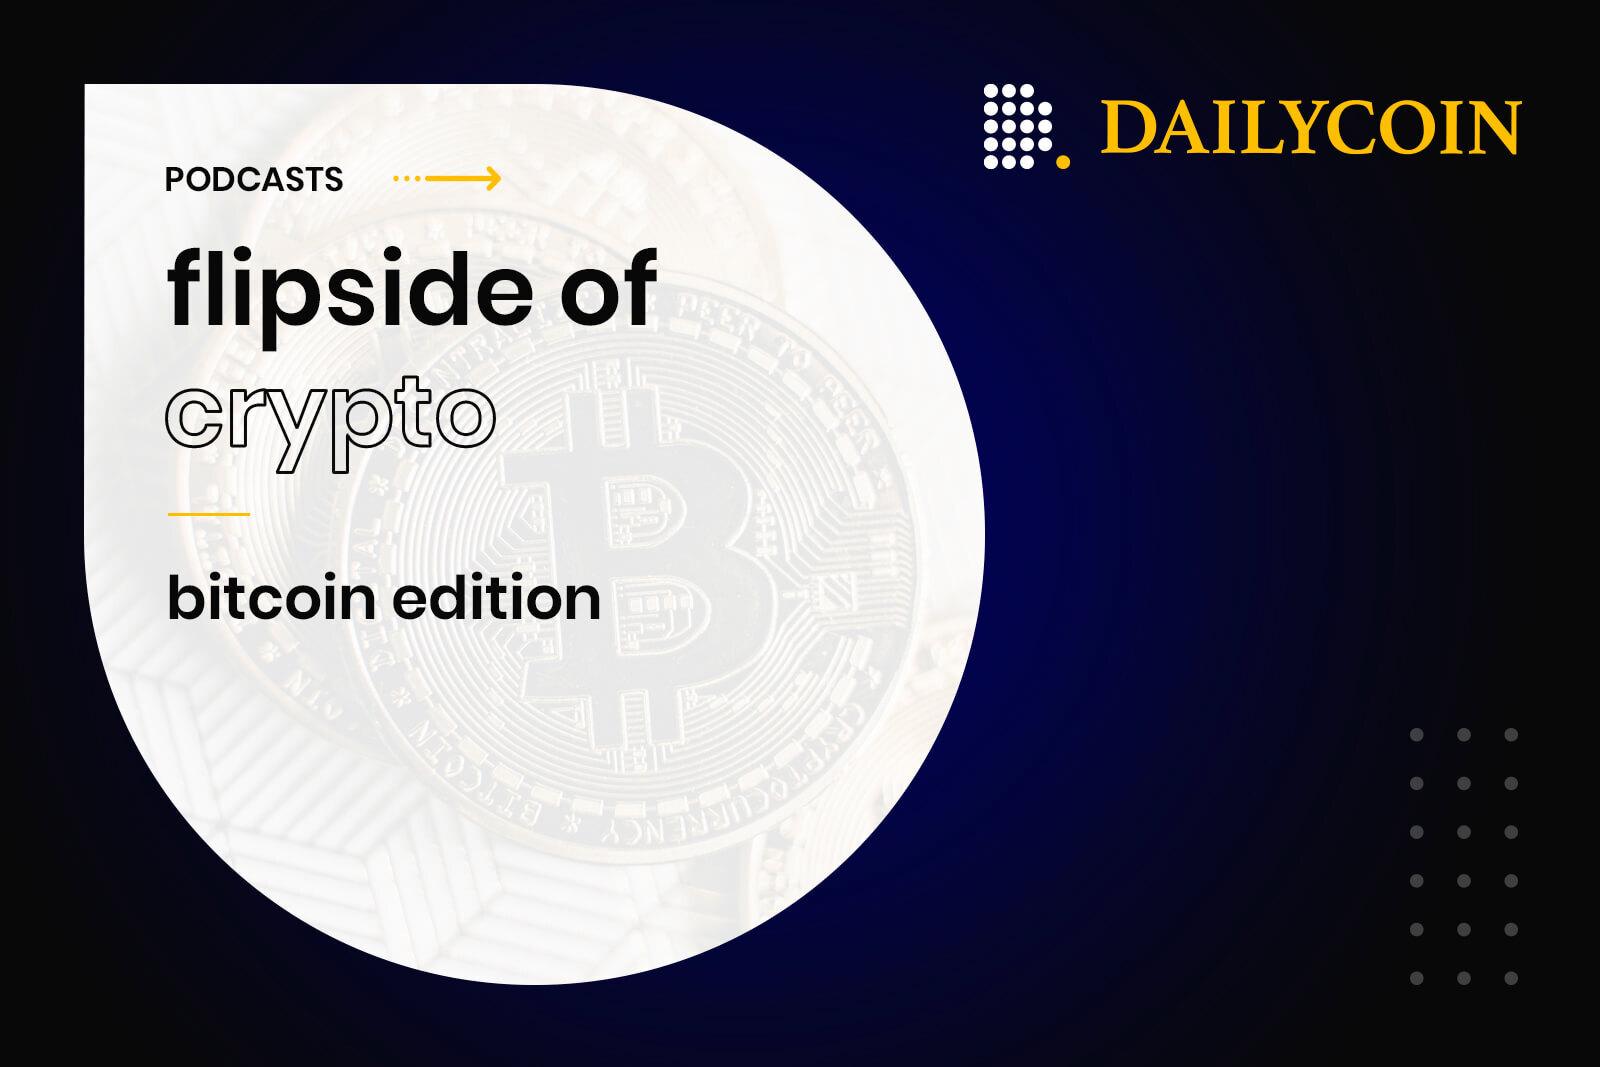 flipside of crypto bitcoin illusionary adoption